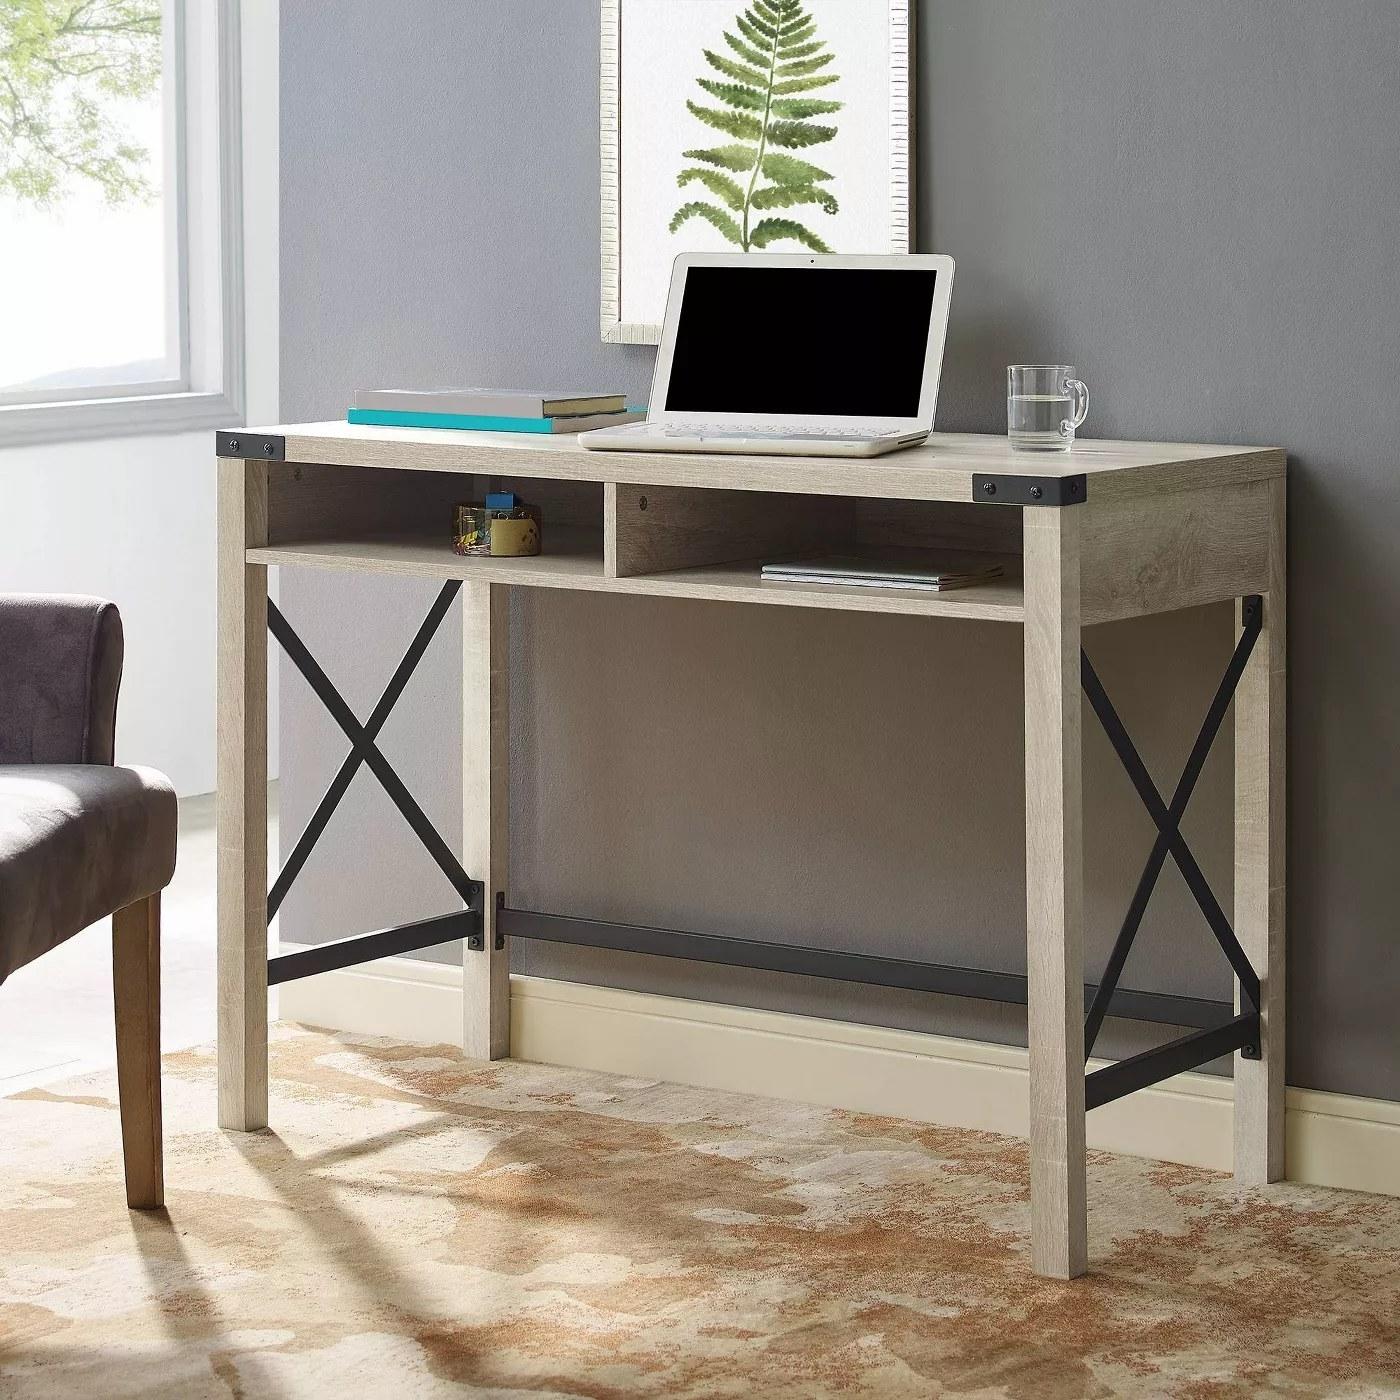 The desk in white oak